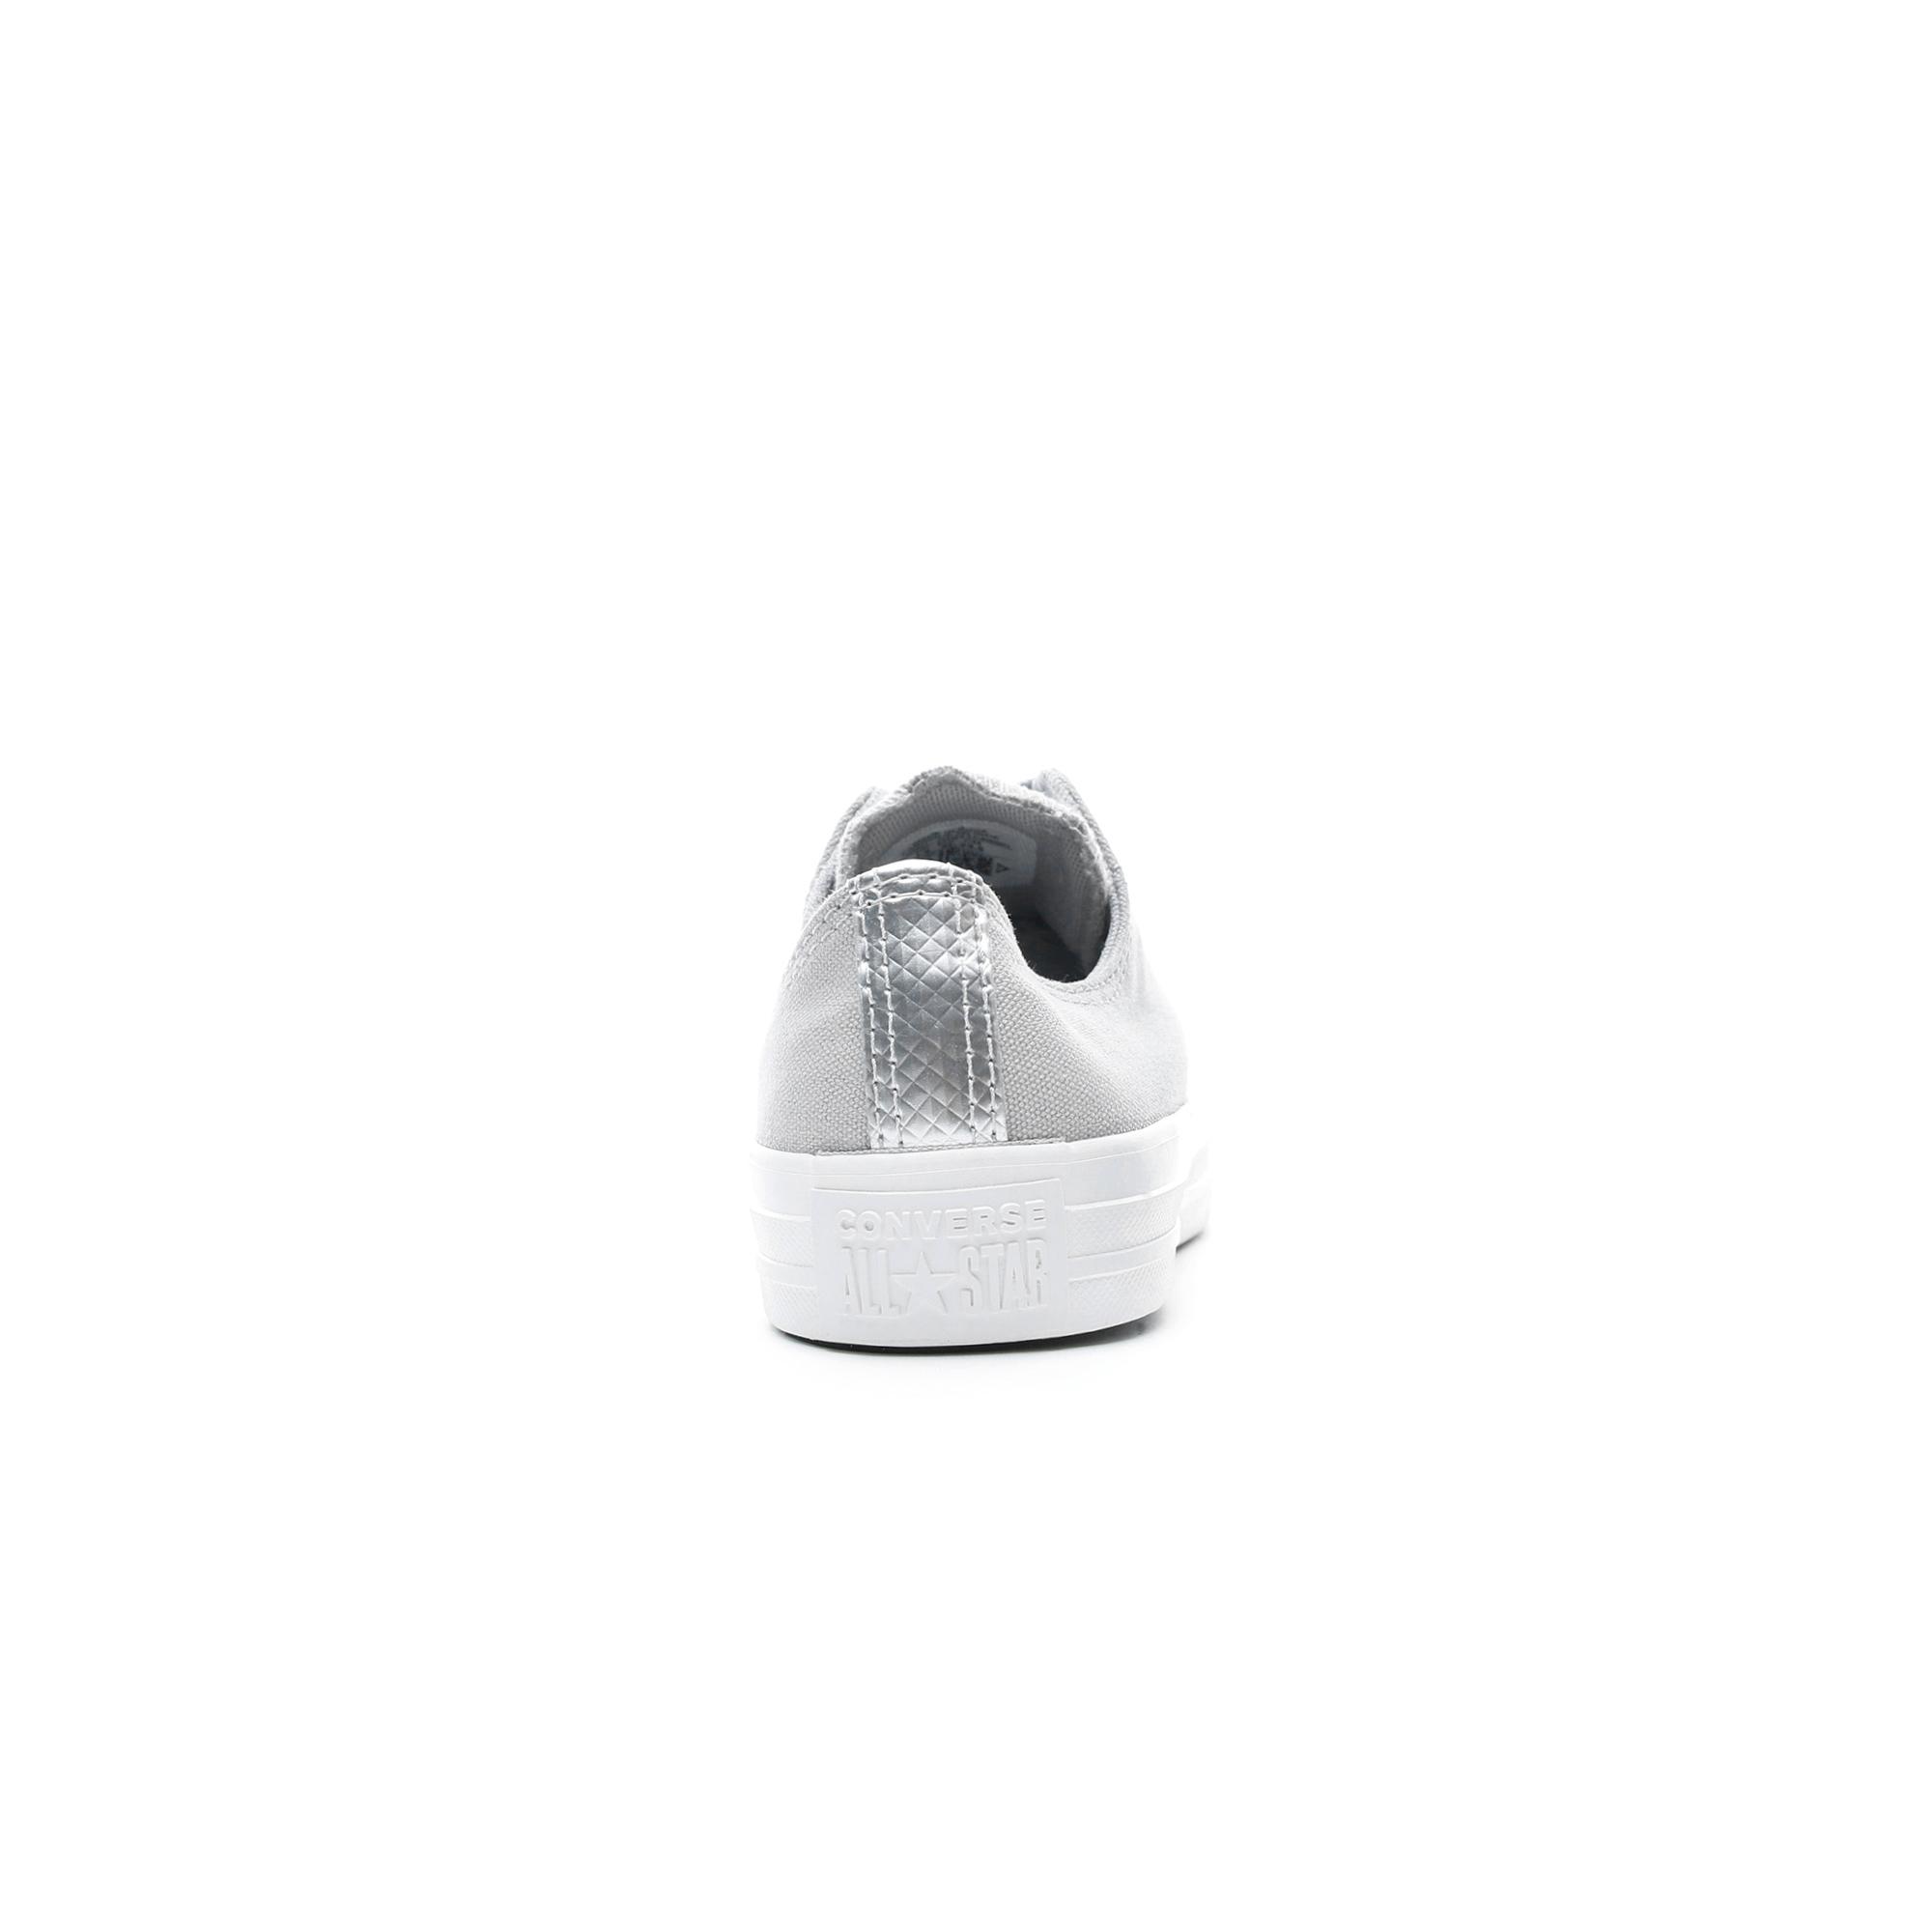 Converse Chuck Taylor All Star Kadın Gri Sneaker